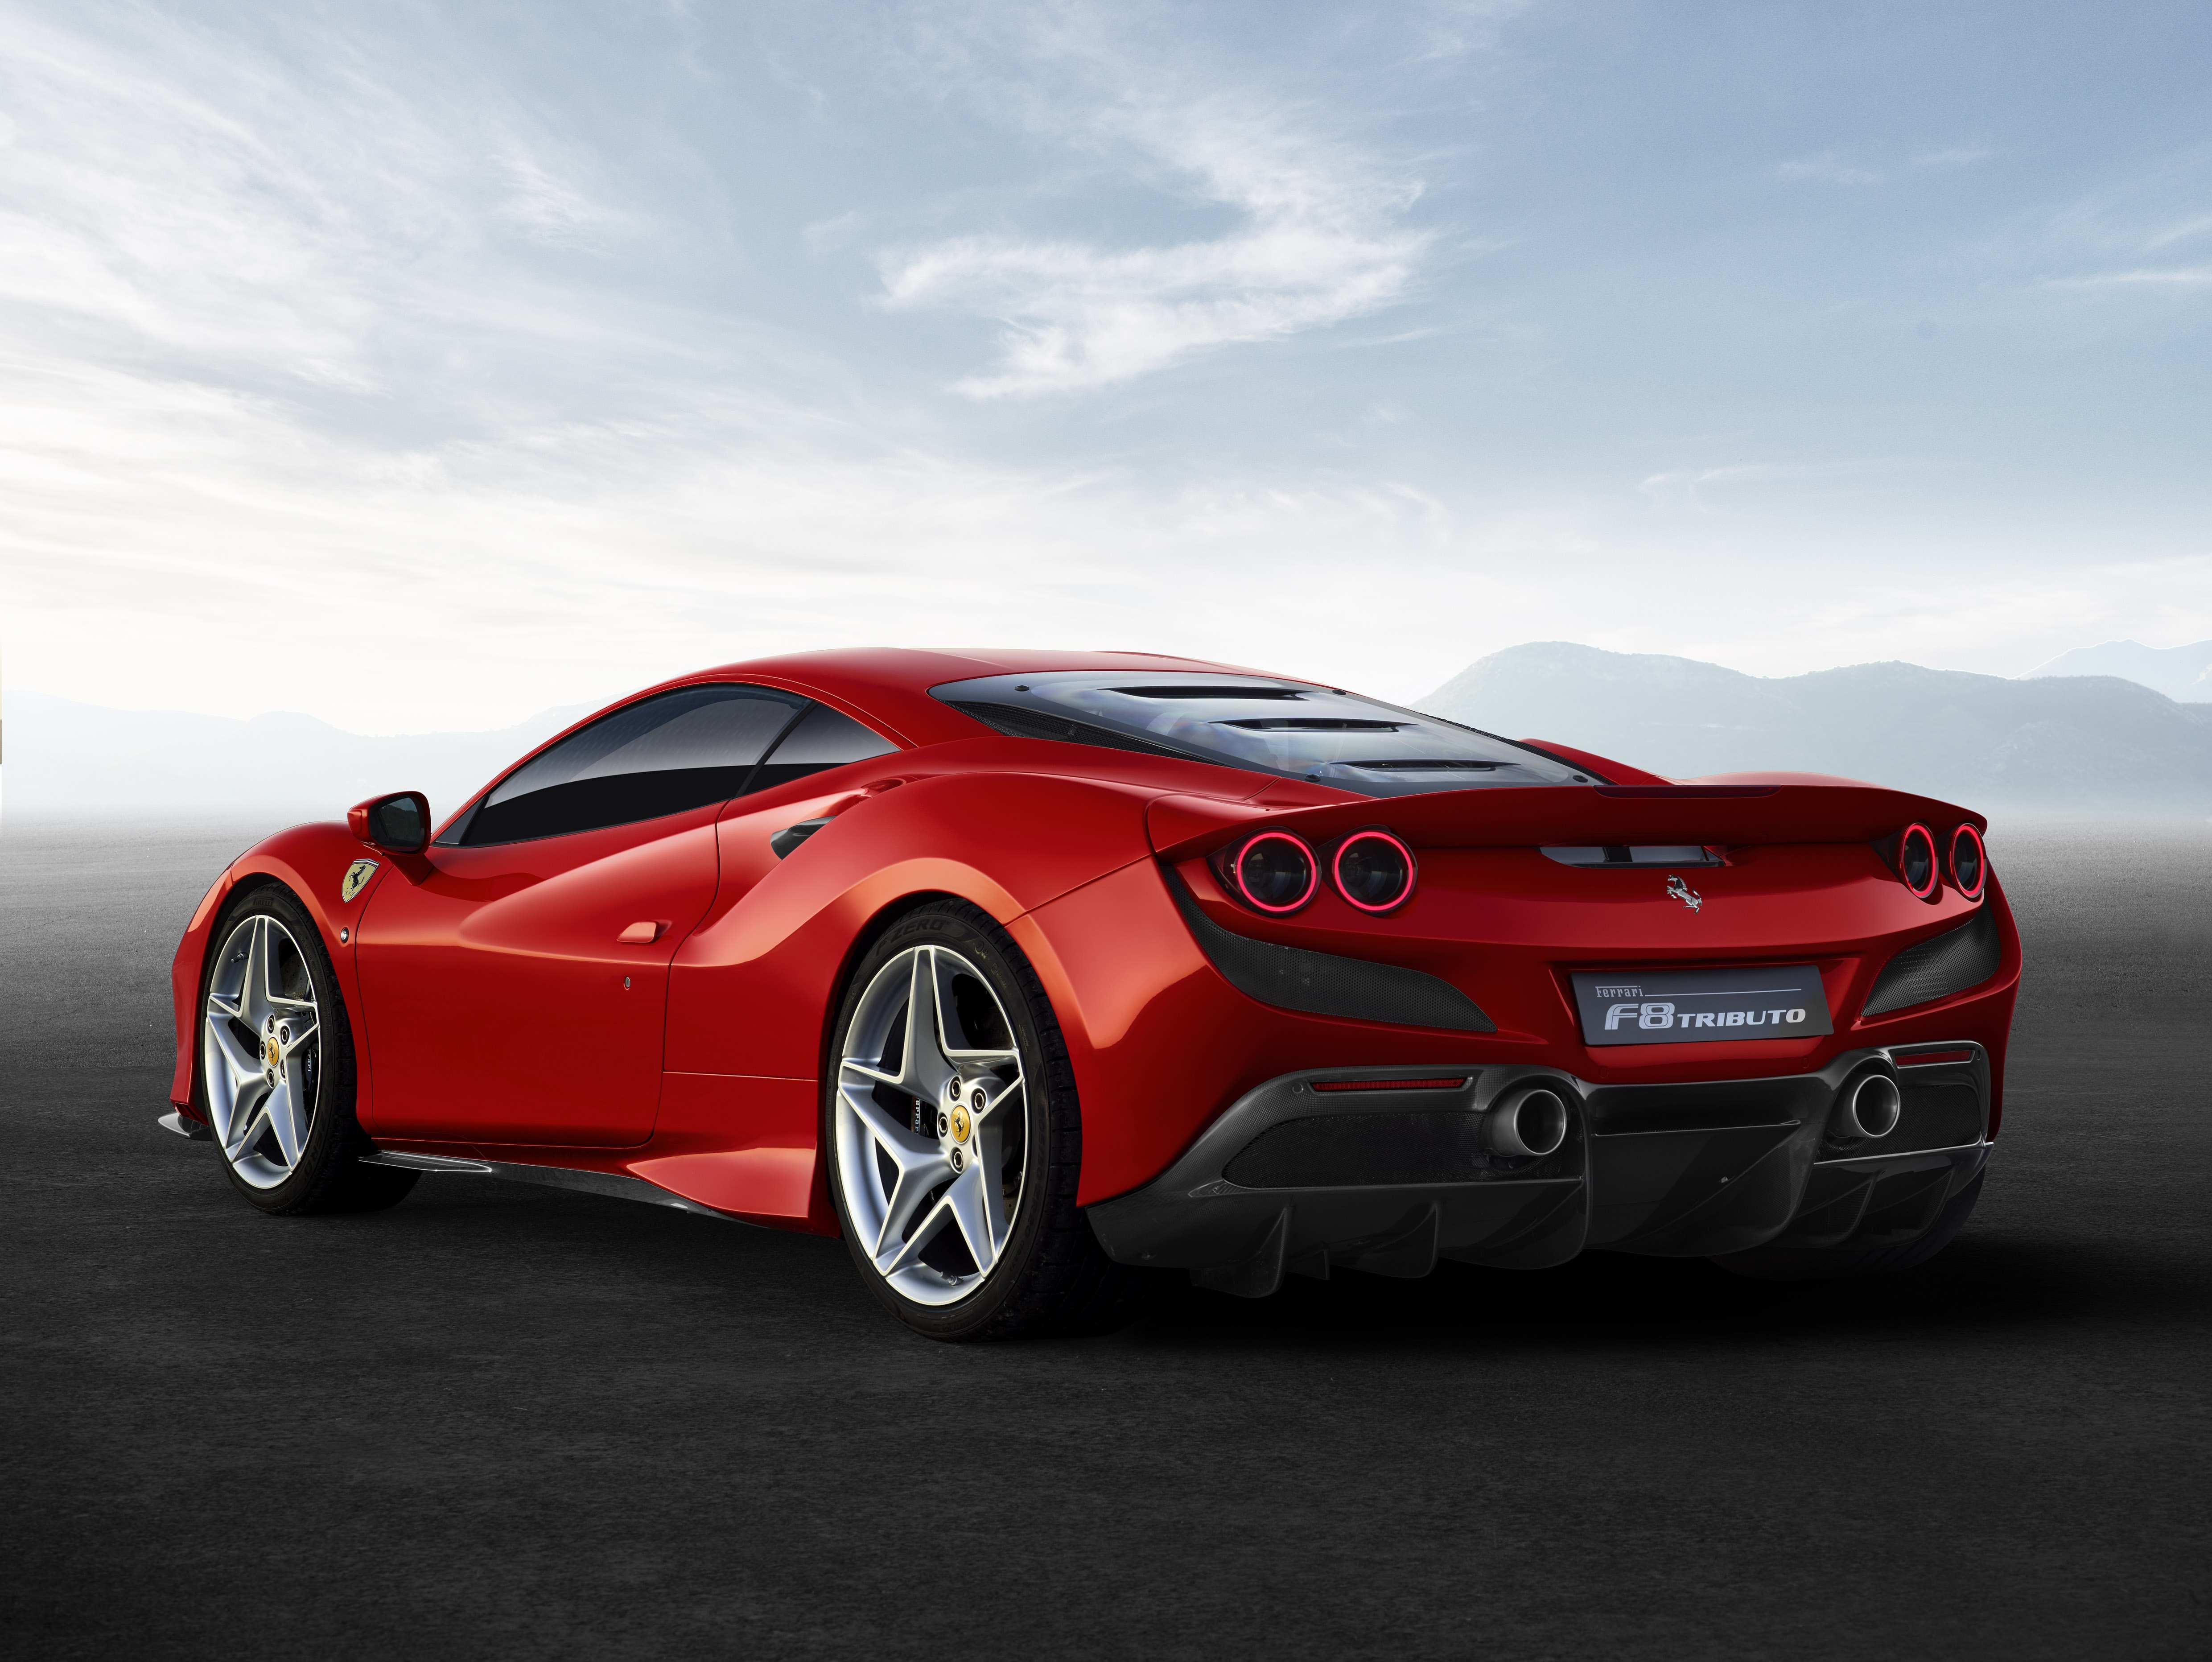 22 Gallery of Ferrari B 2020 Configurations with Ferrari B 2020